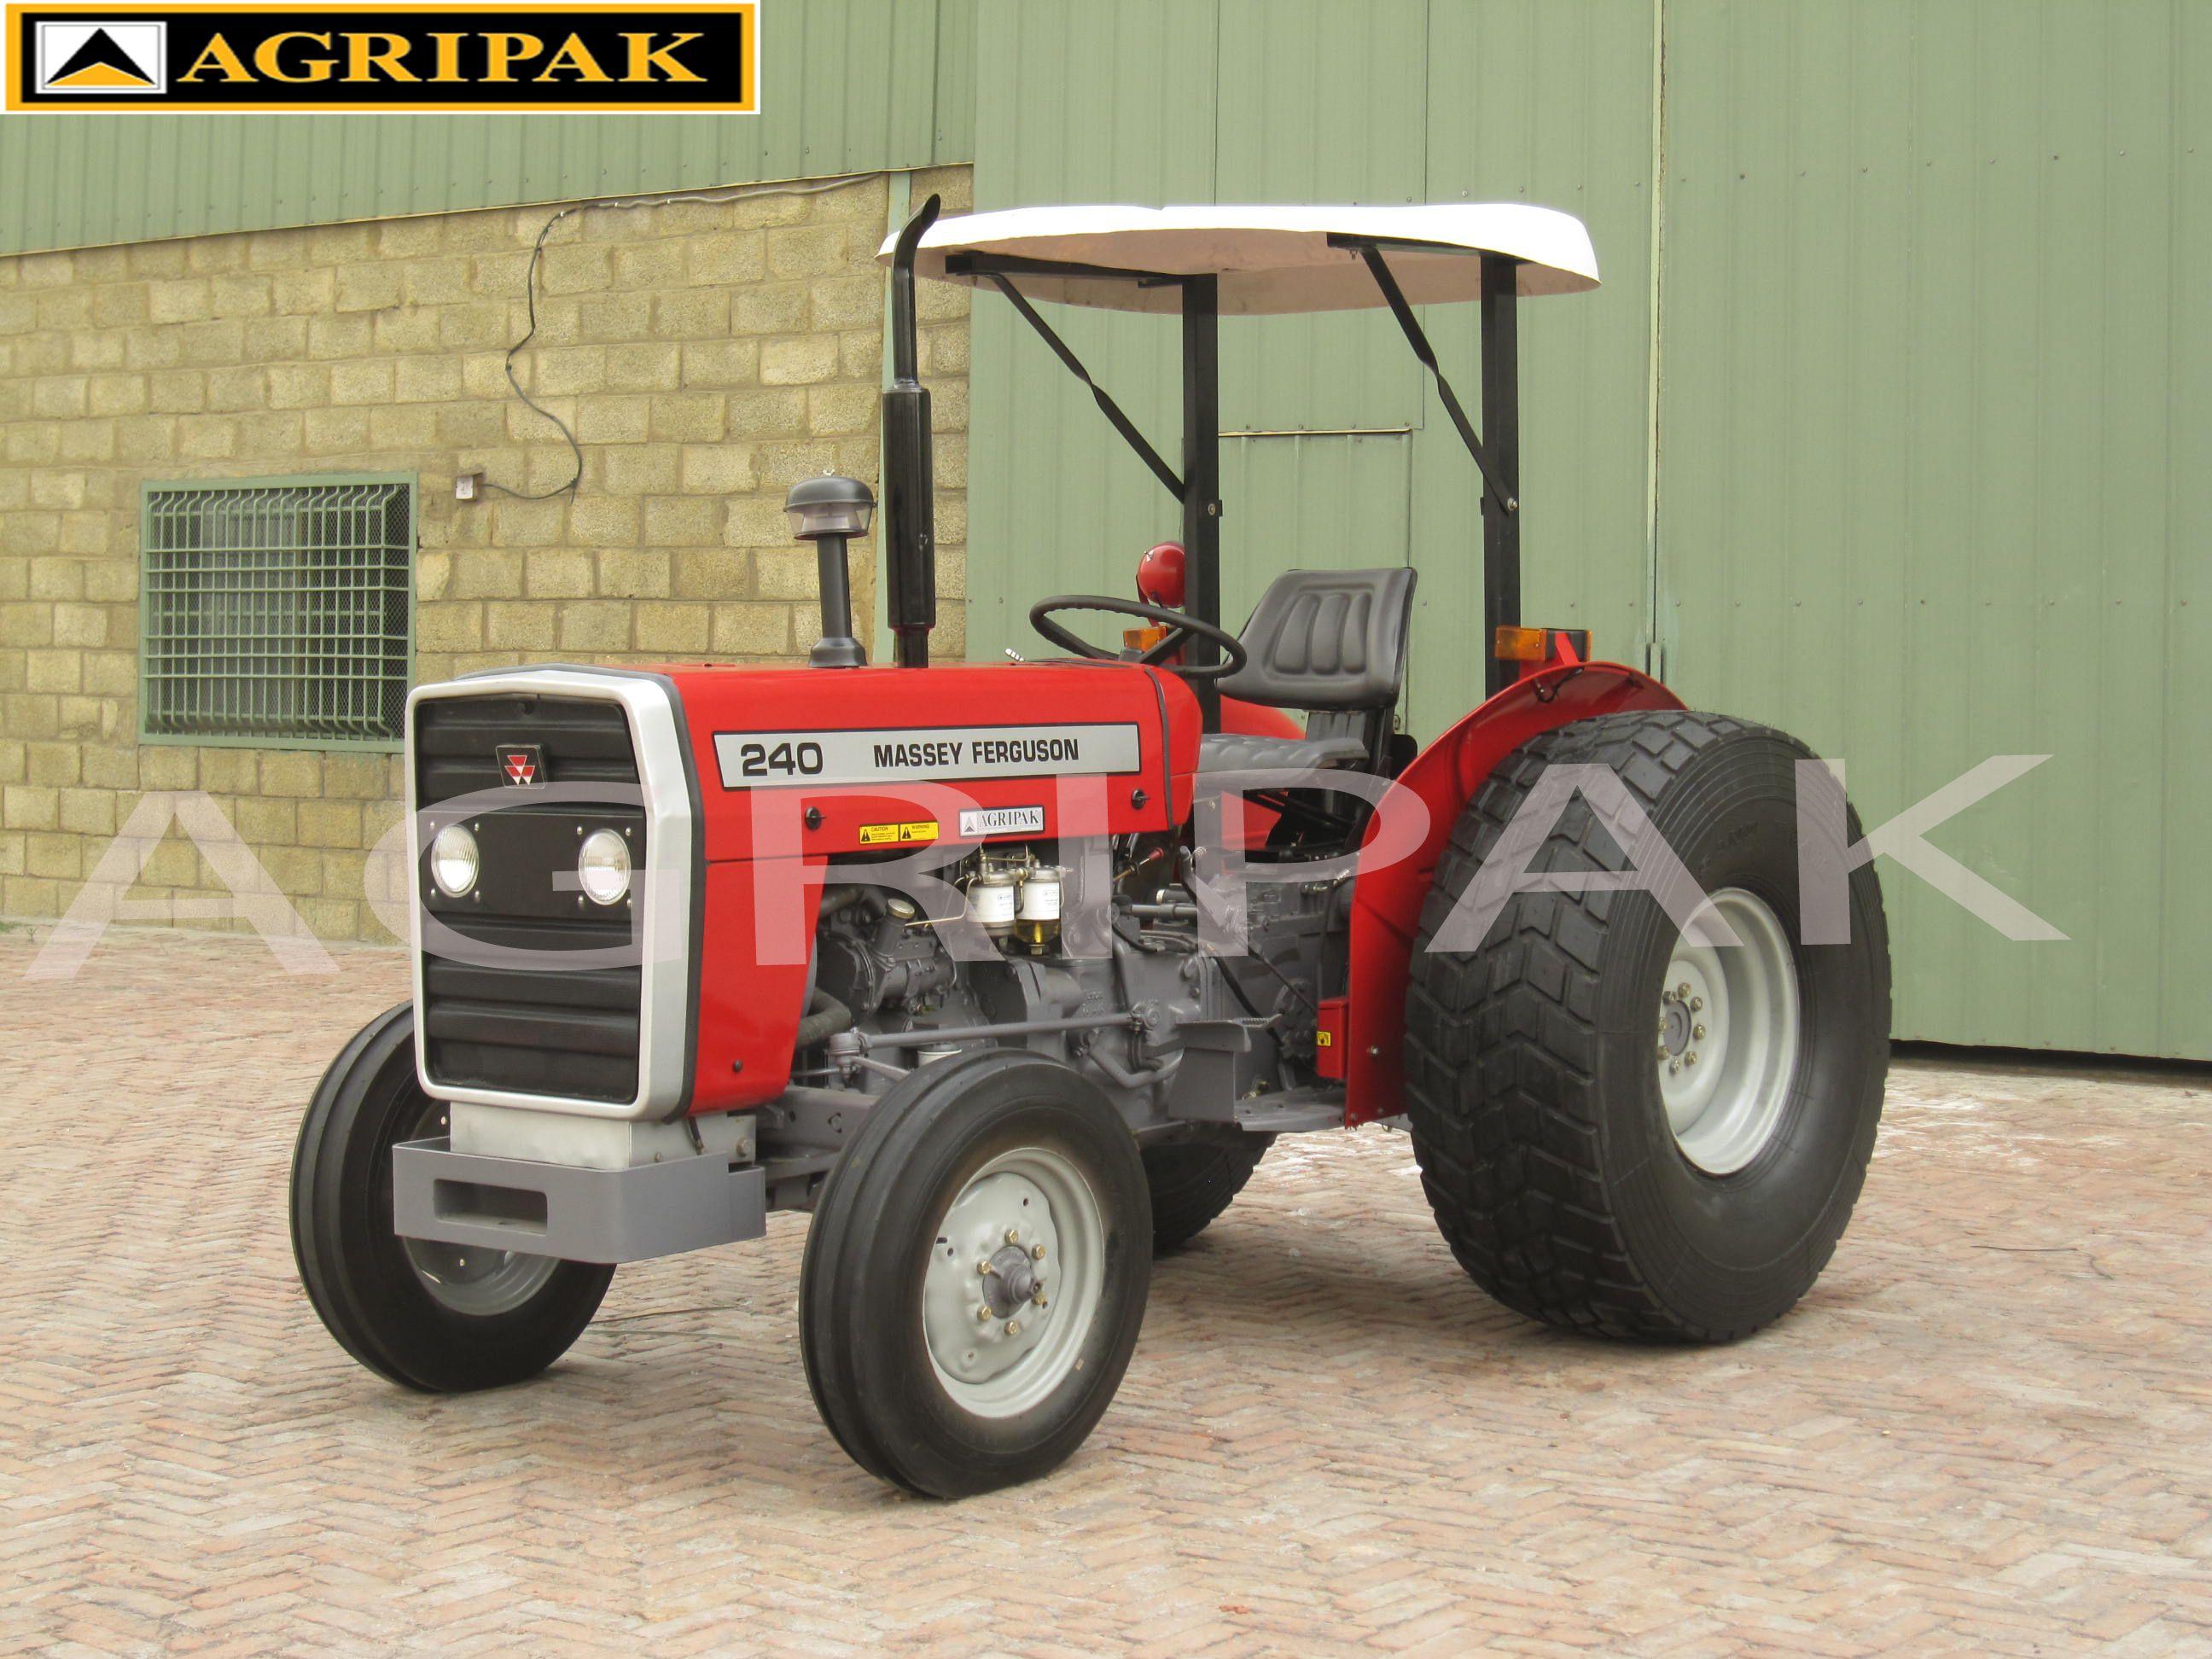 MF 240 (50 HP) available at Agripak. Hydraulic systems